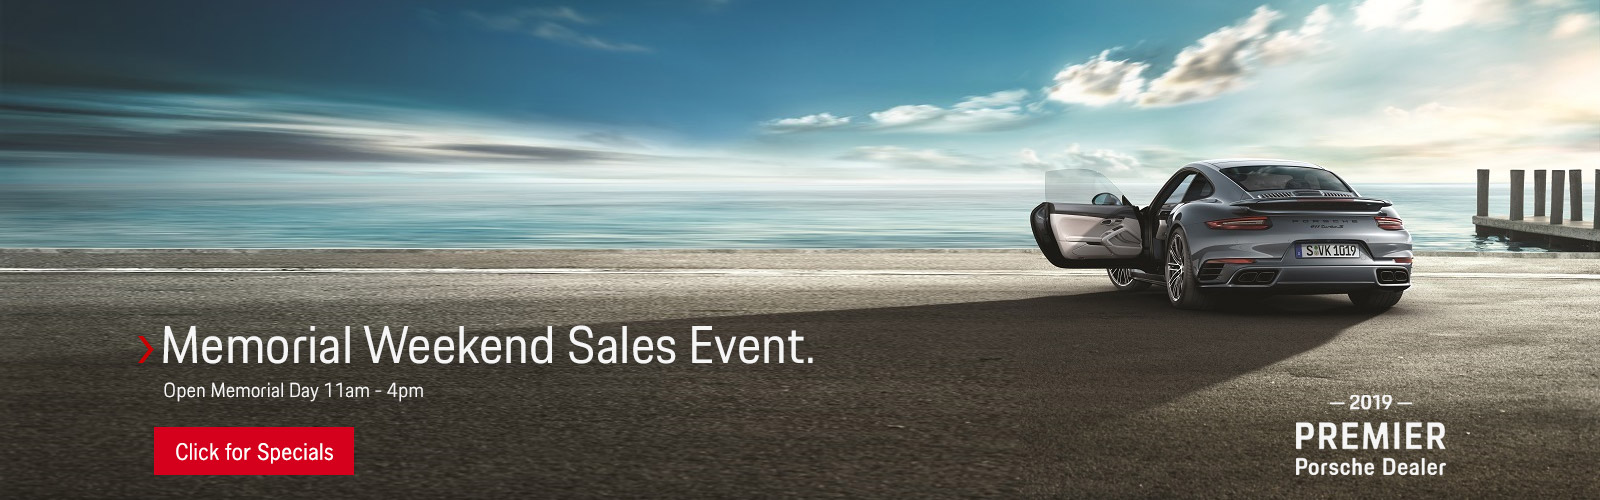 Memorial Day Weekend Sales Event